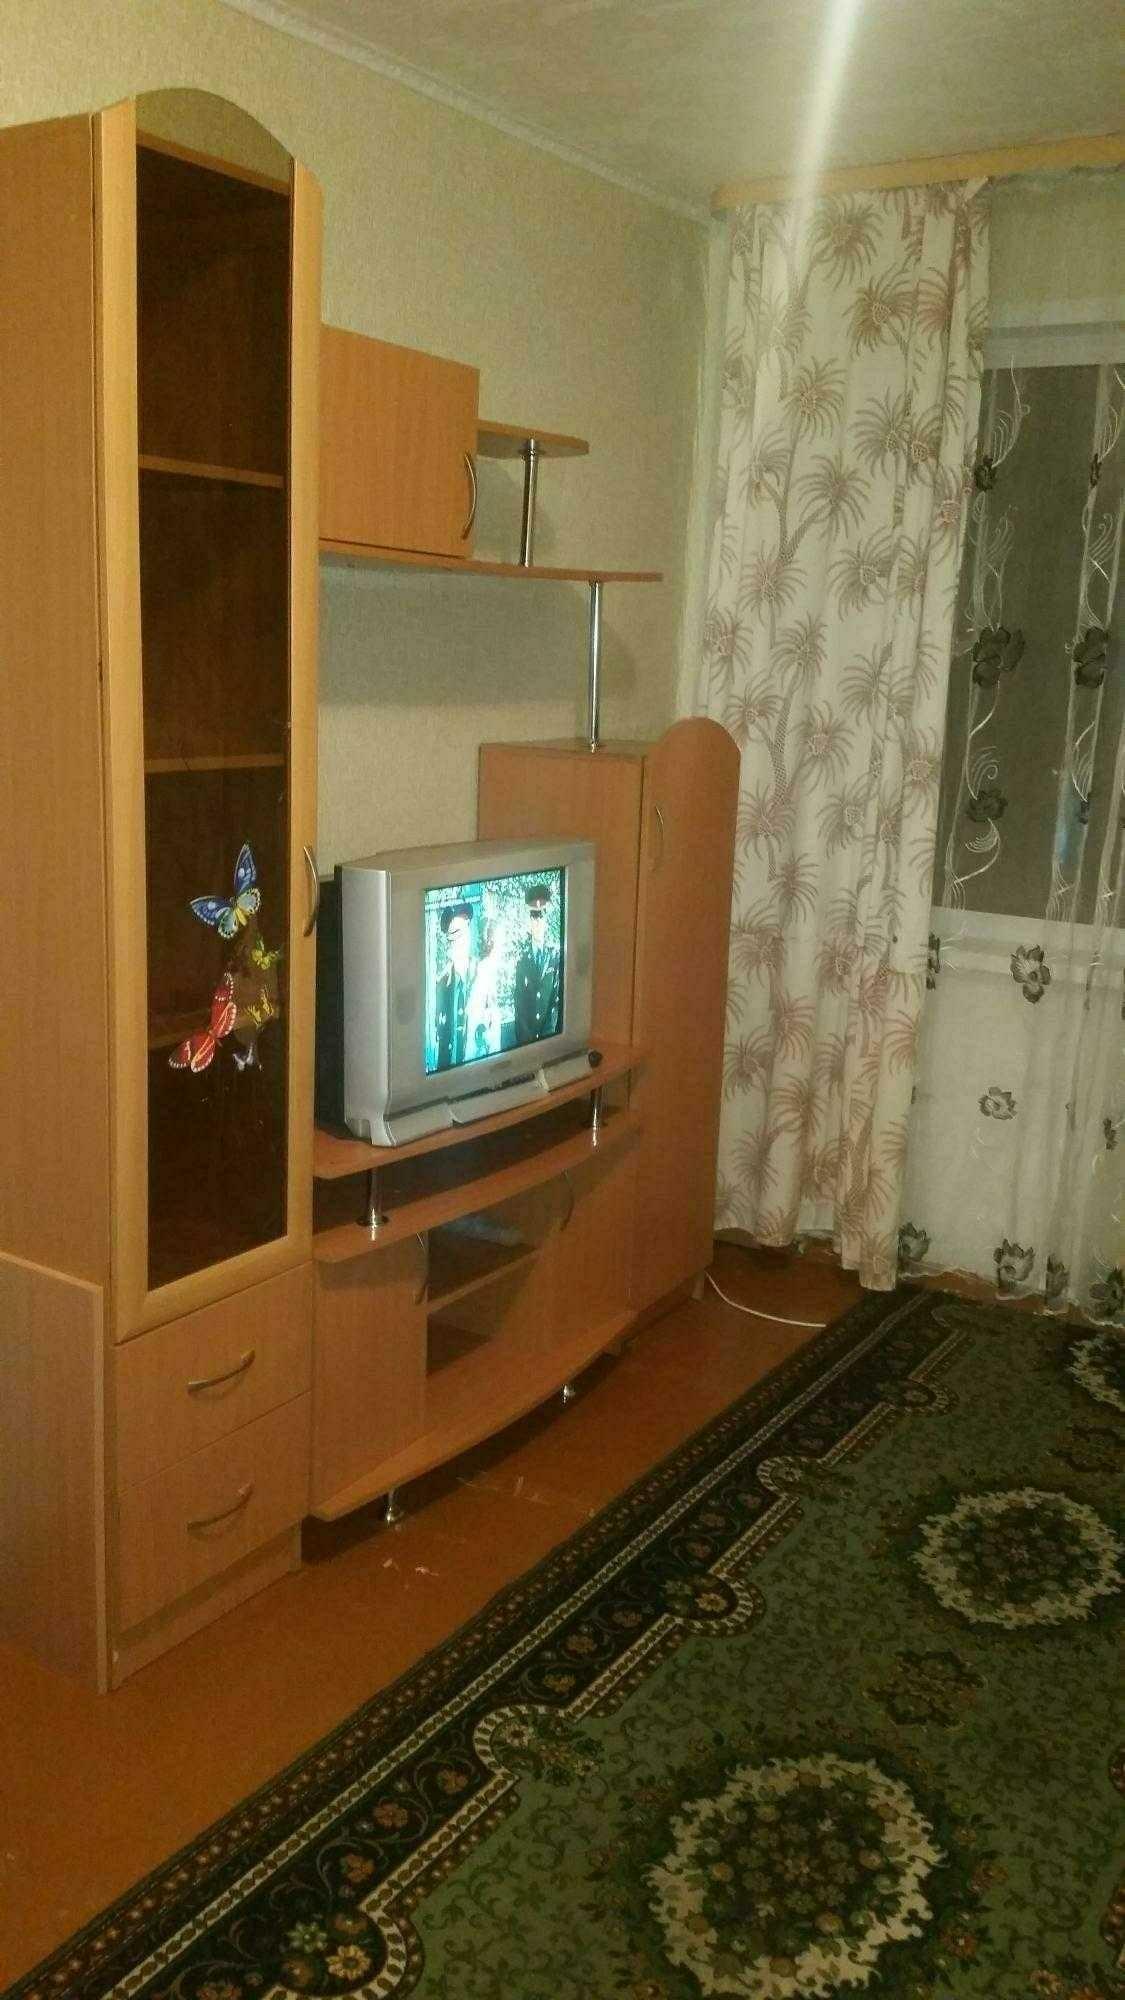 1к квартира улица 26 Бакинских комиссаров, 13 | 10000 | аренда в Красноярске фото 1